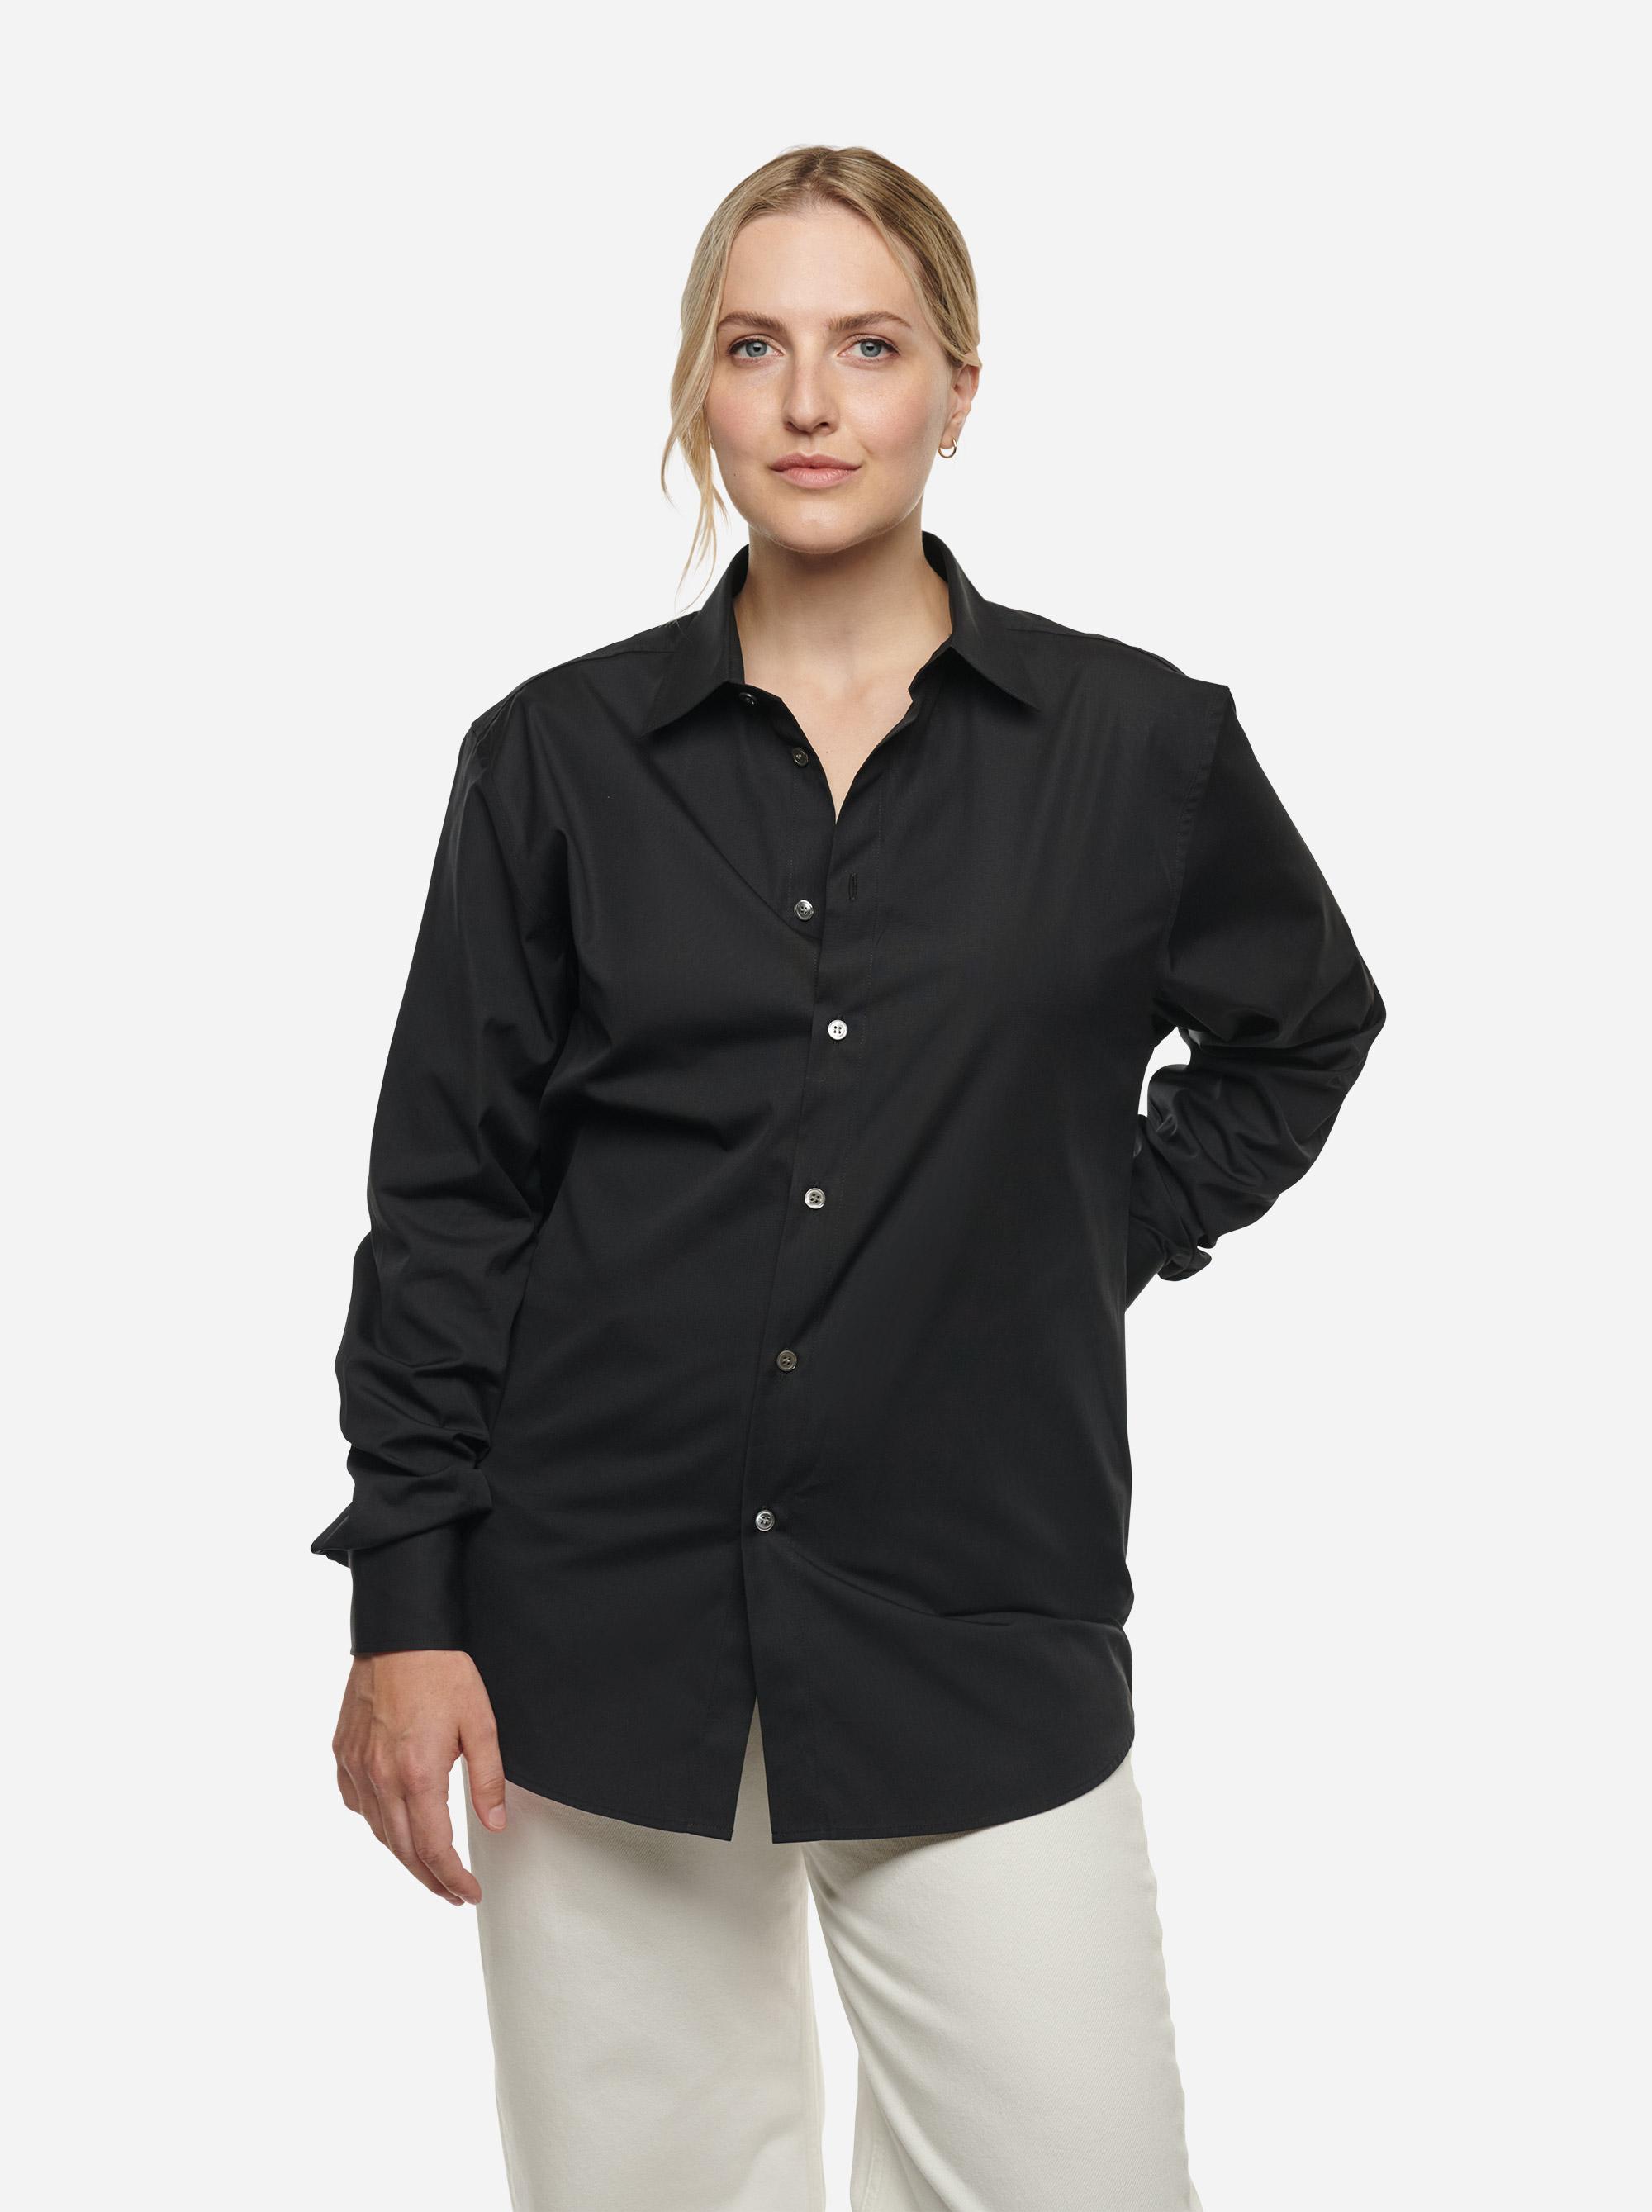 Teym-Shirt-Black-women-mens1